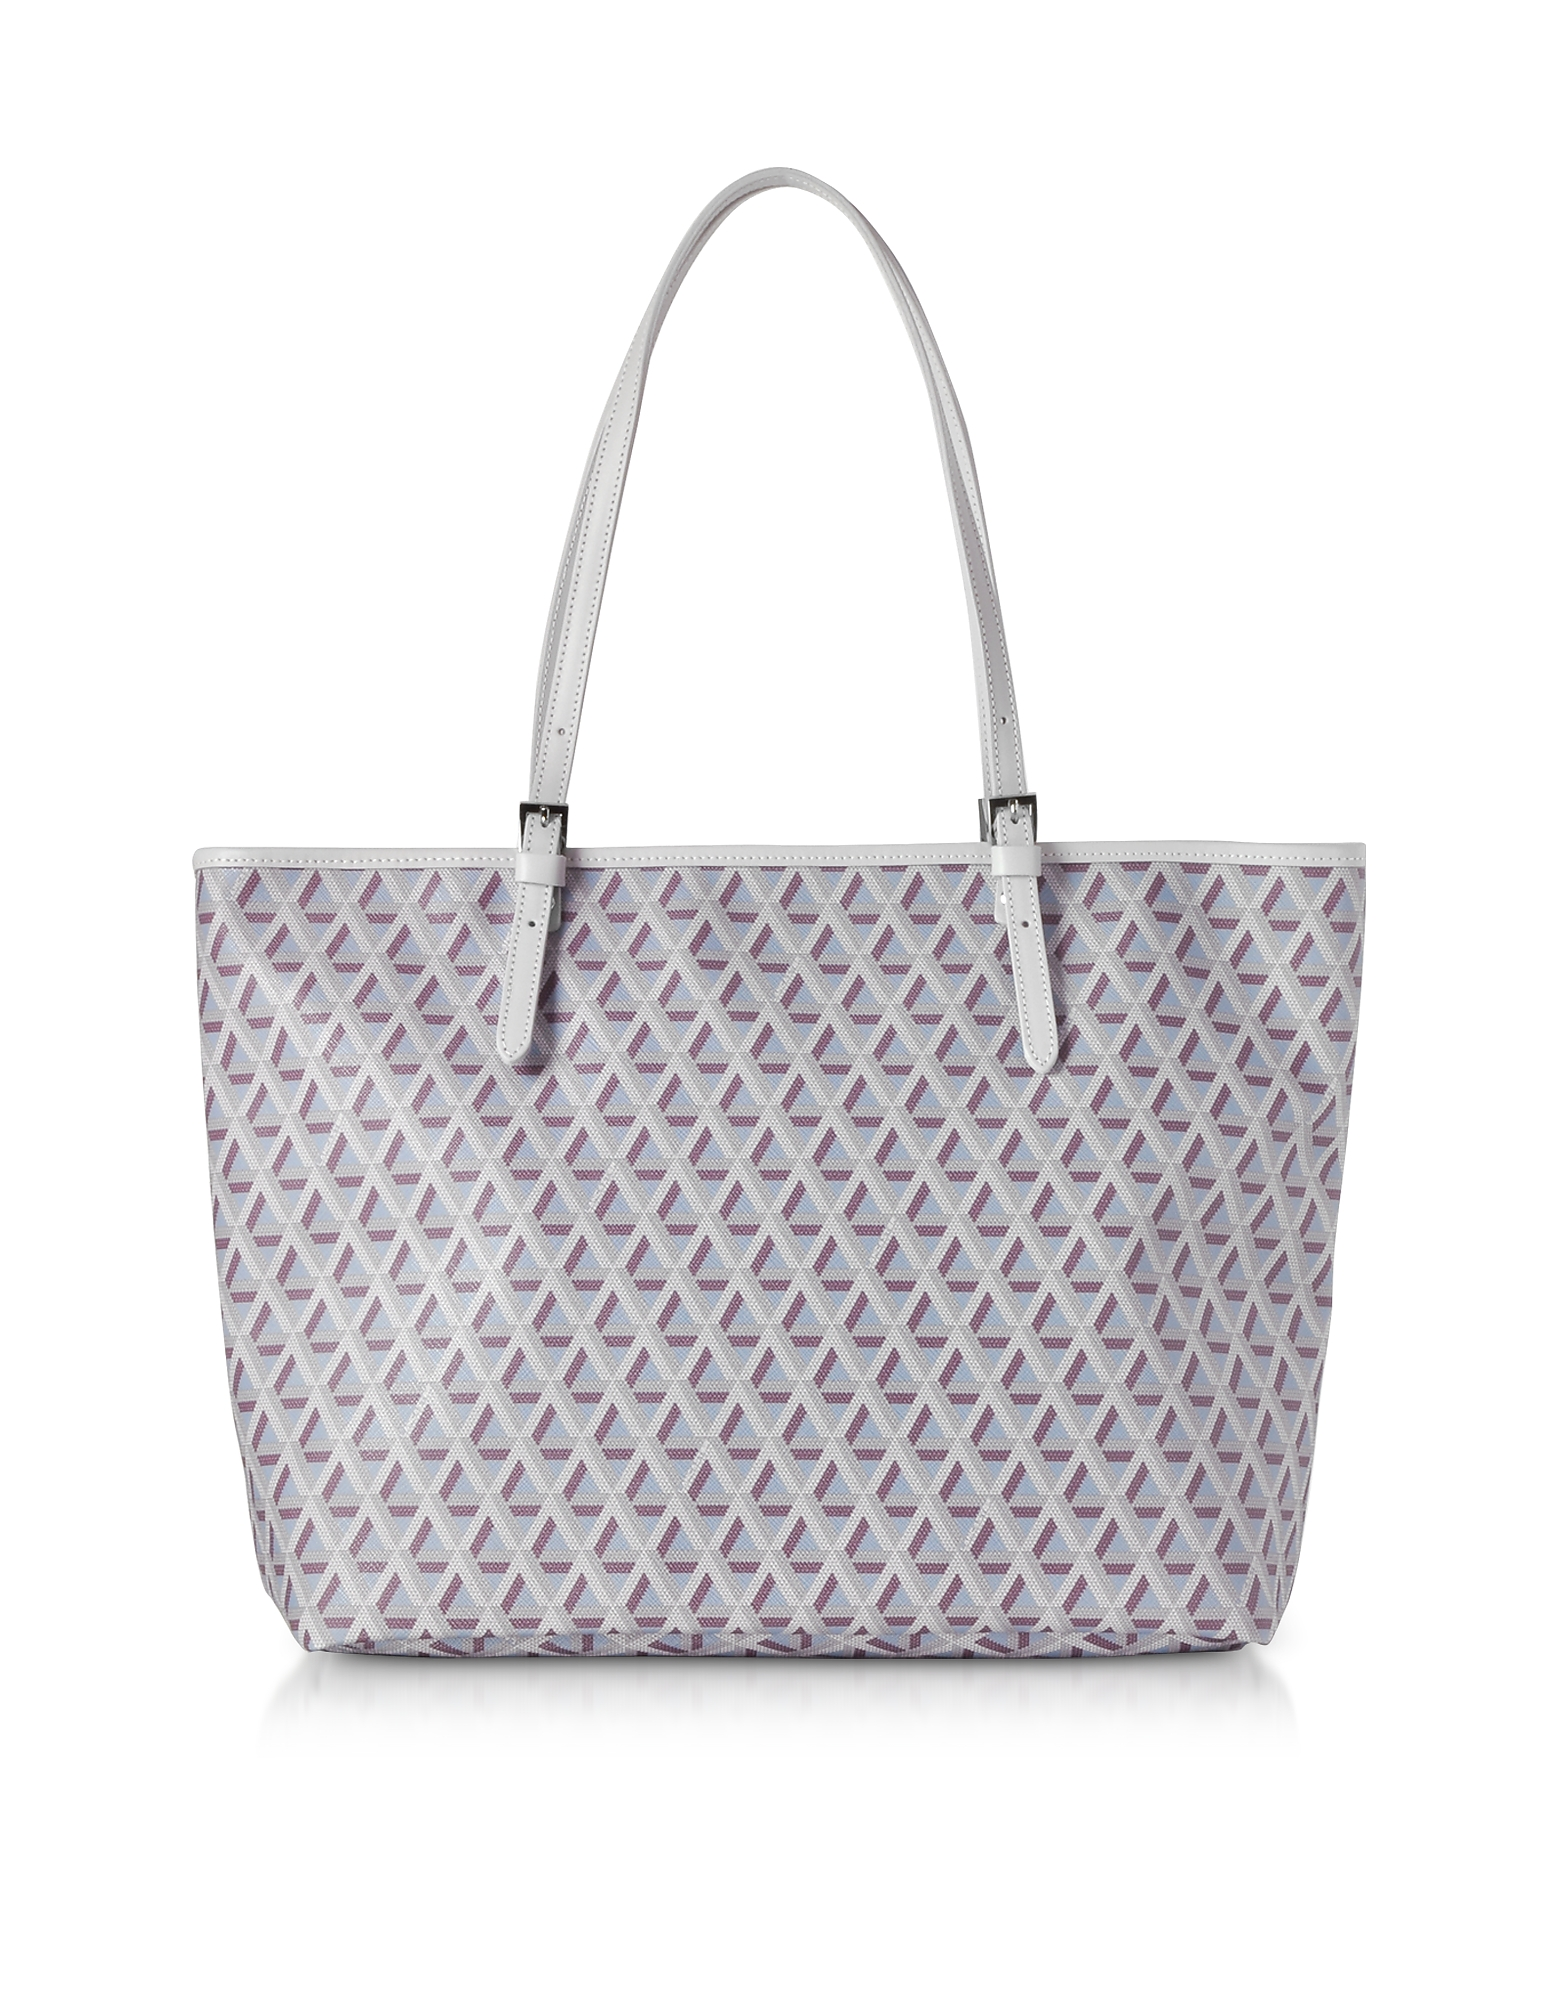 Lancaster Paris Handbags, Ikon Large Tote Bag